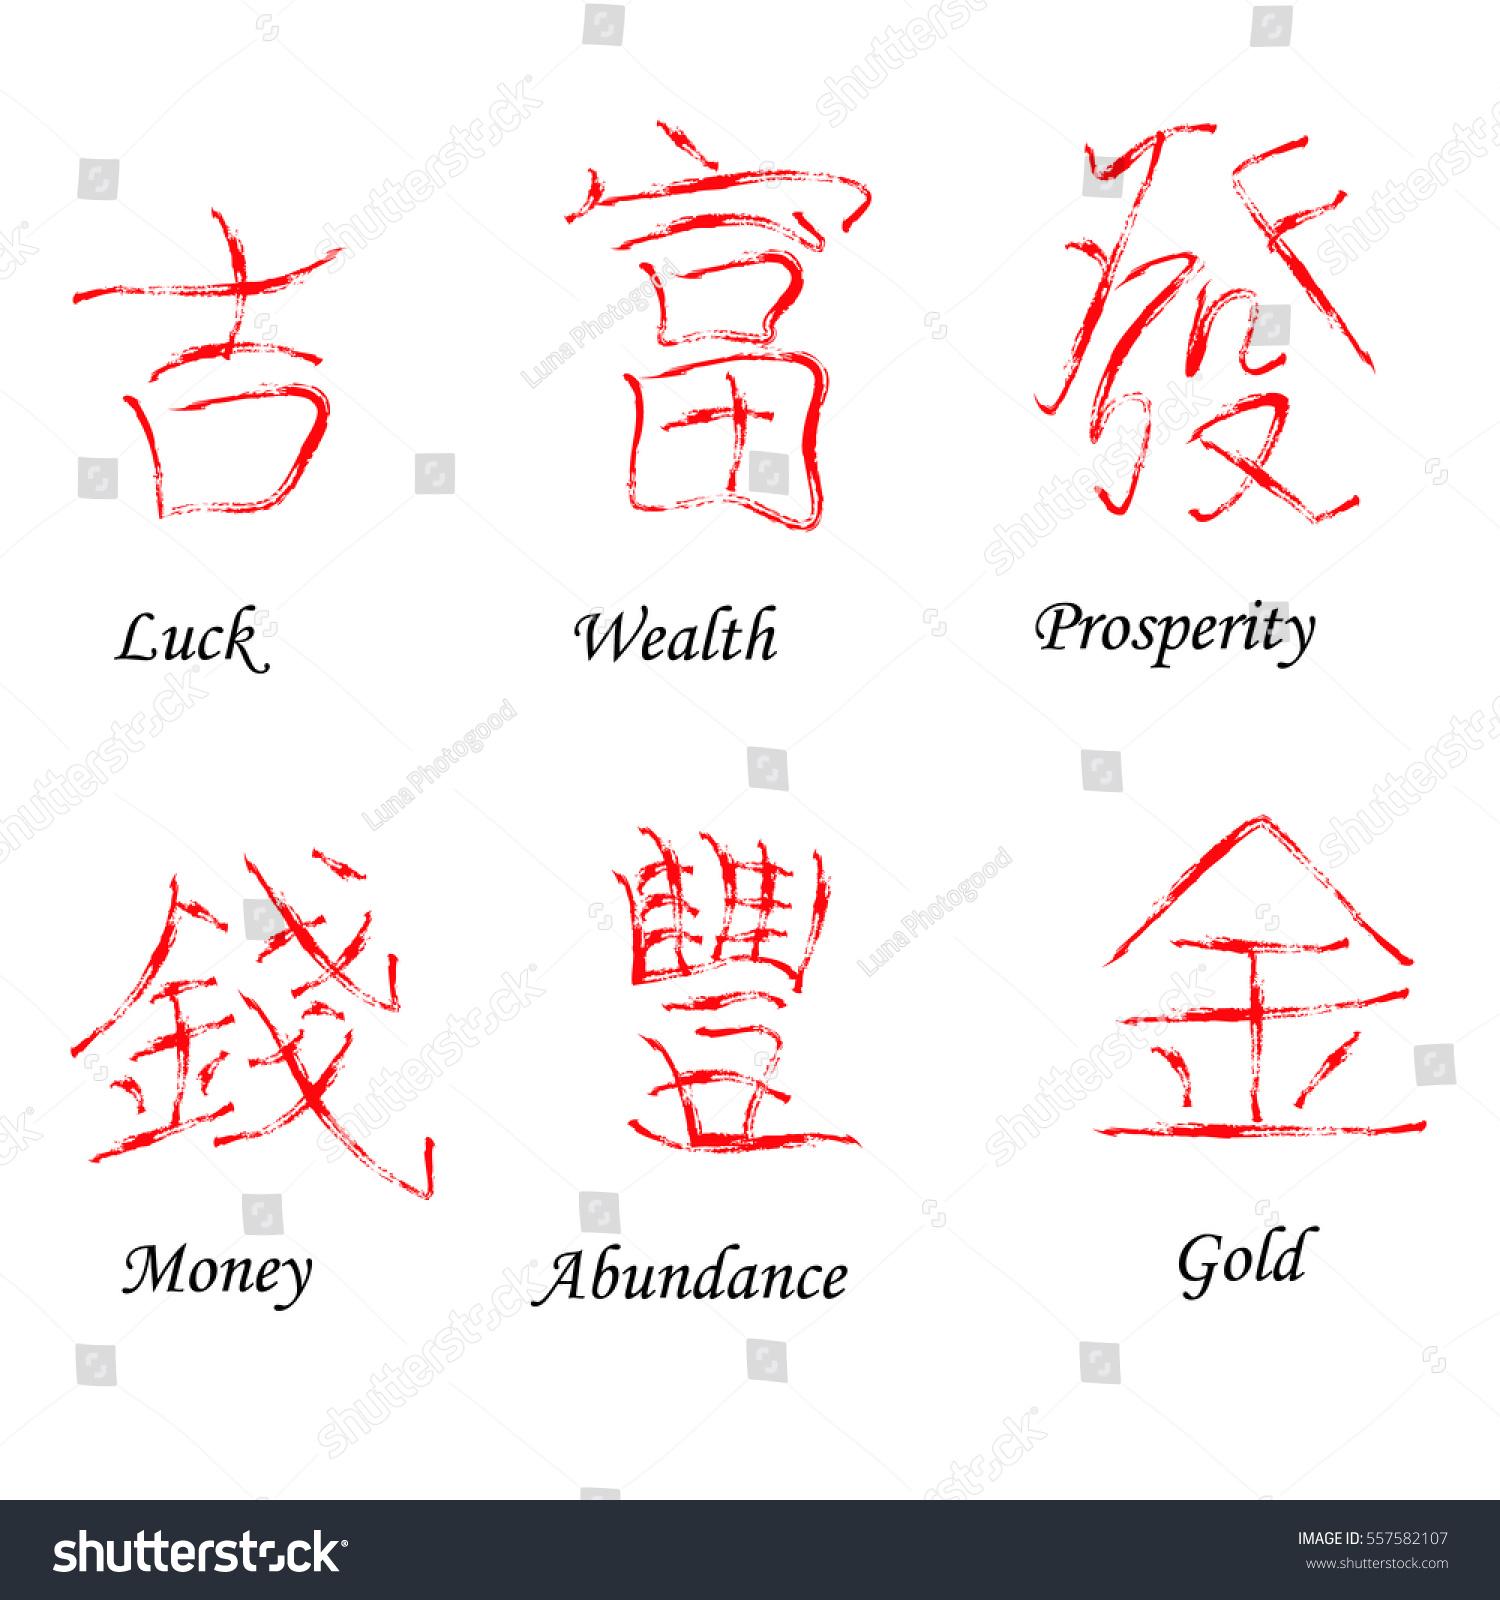 Hieroglyph of wealth and prosperity 44